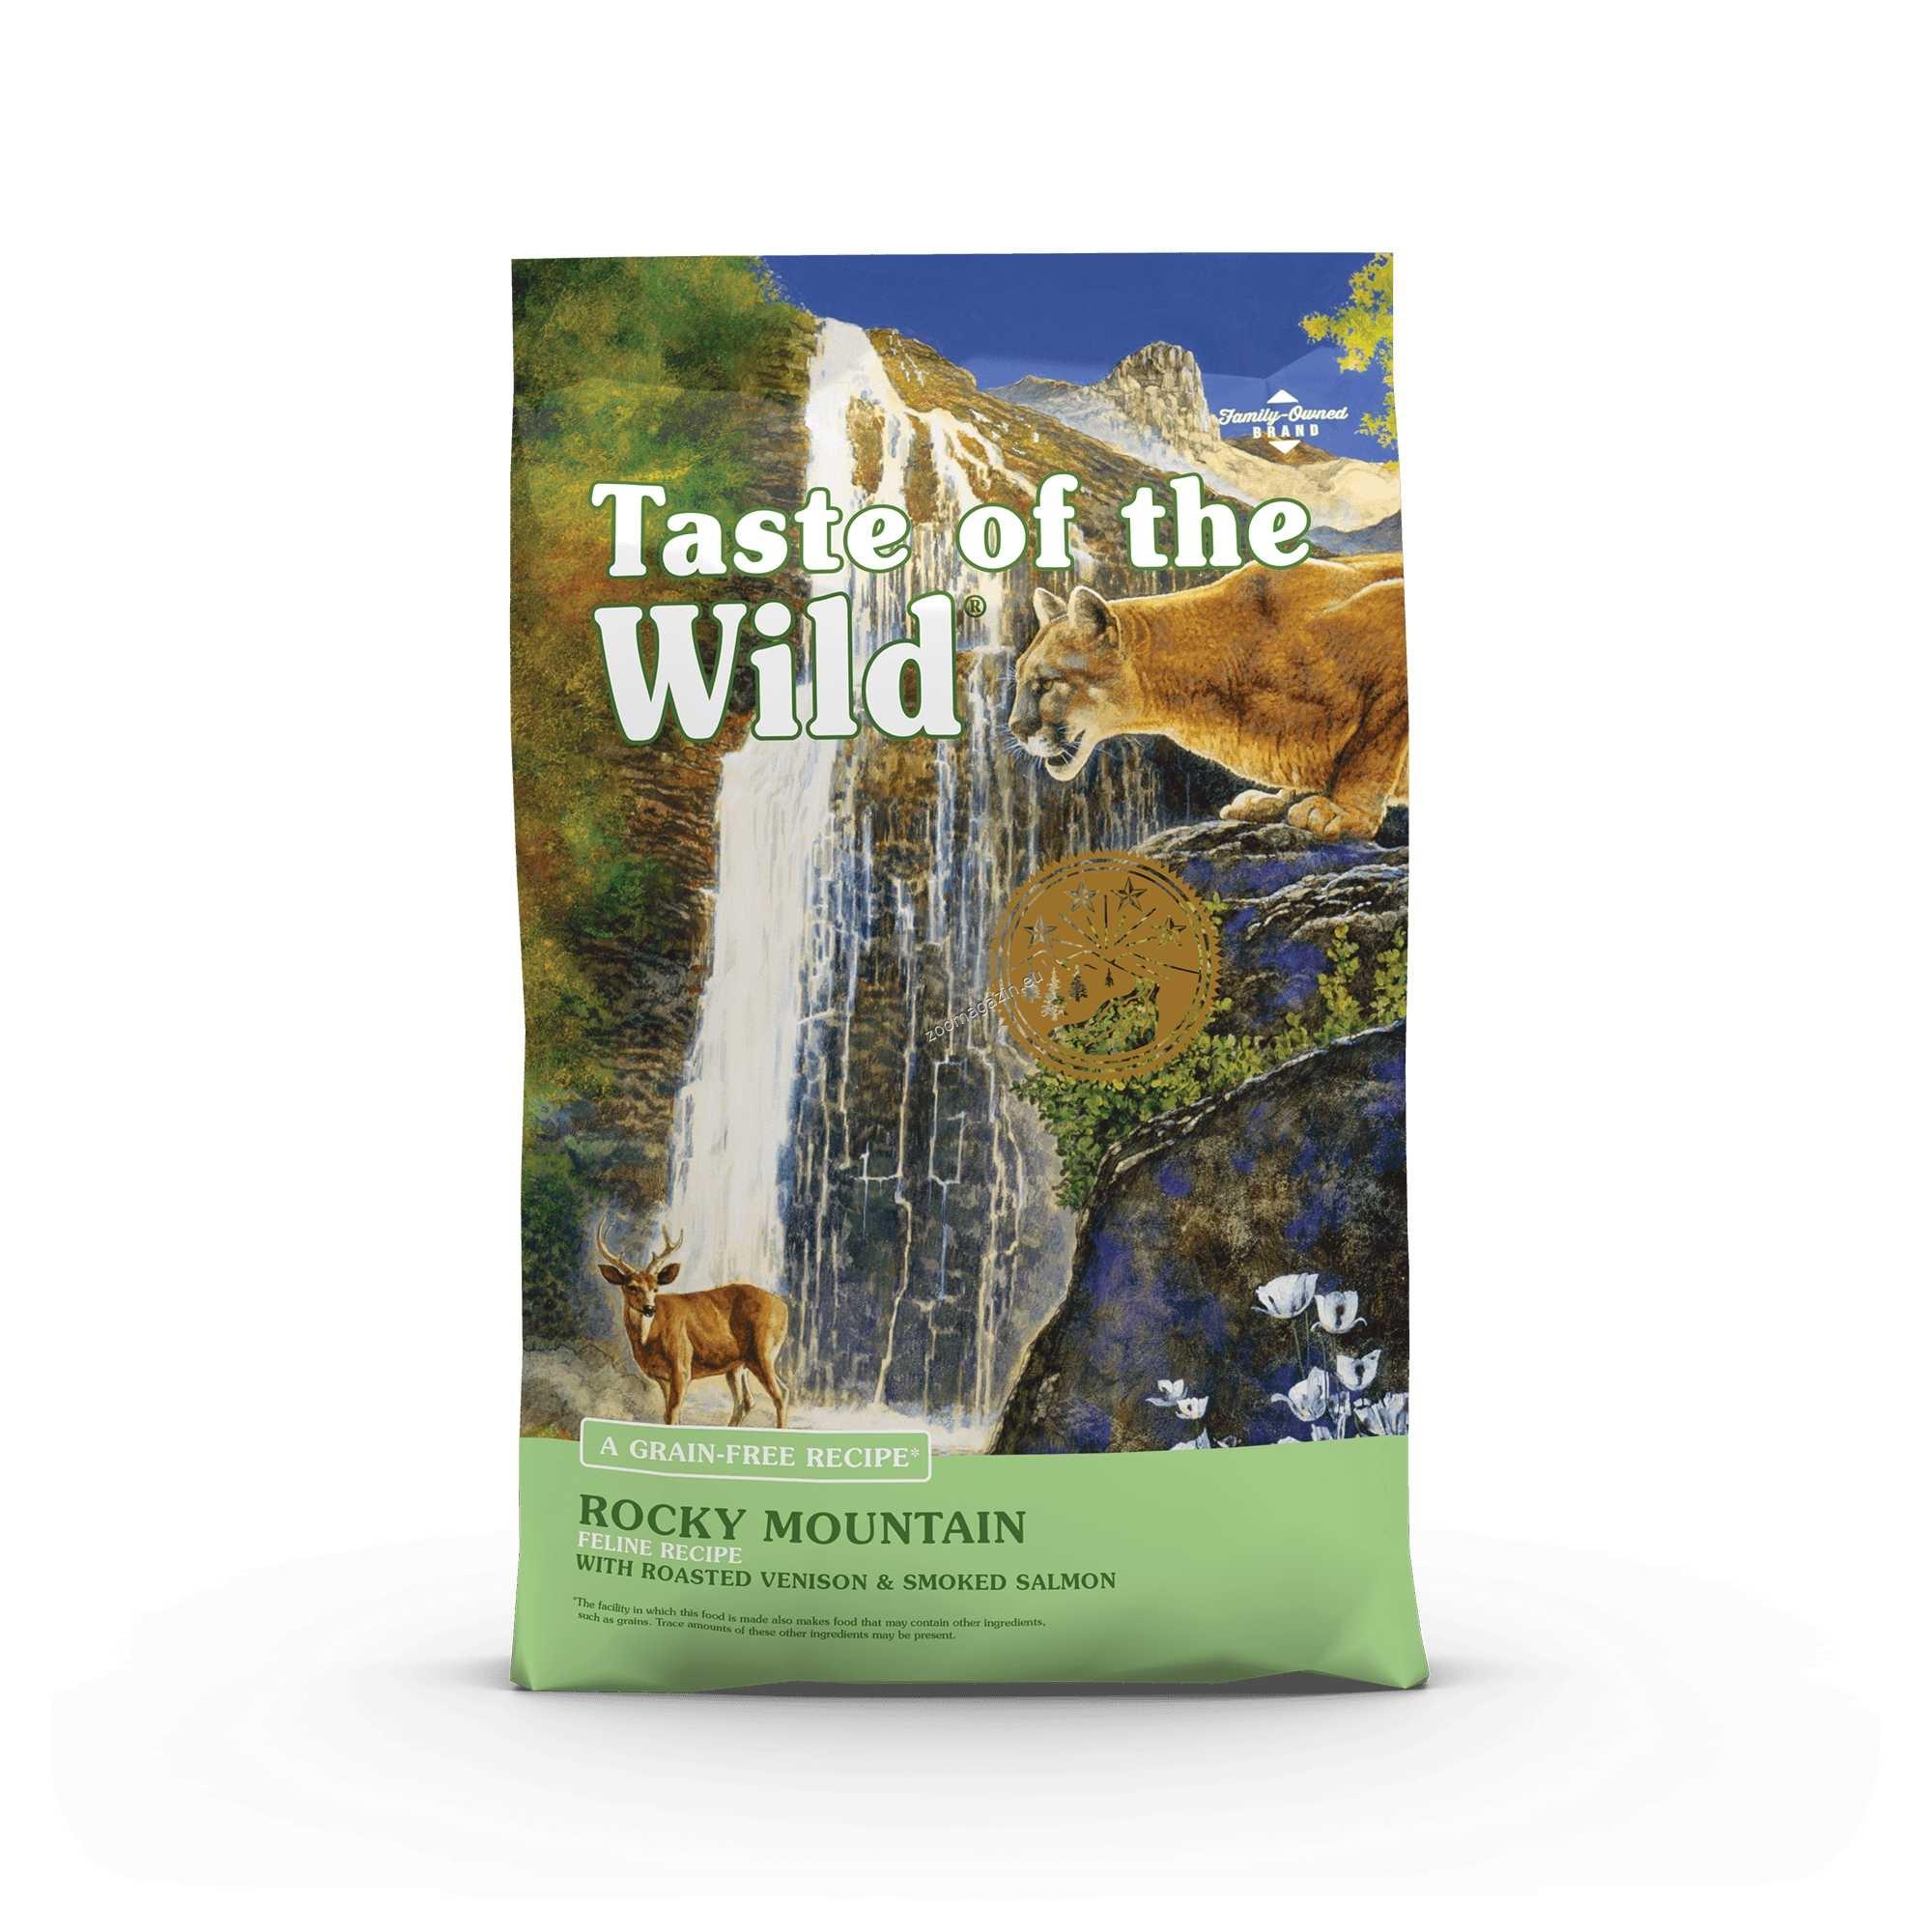 Taste of the Wild Rocky Mountain Feline Formula with Roasted Venison & Smoked Salmon - котешка храна с печено еленско месо и пушена сьомга 7 кг.